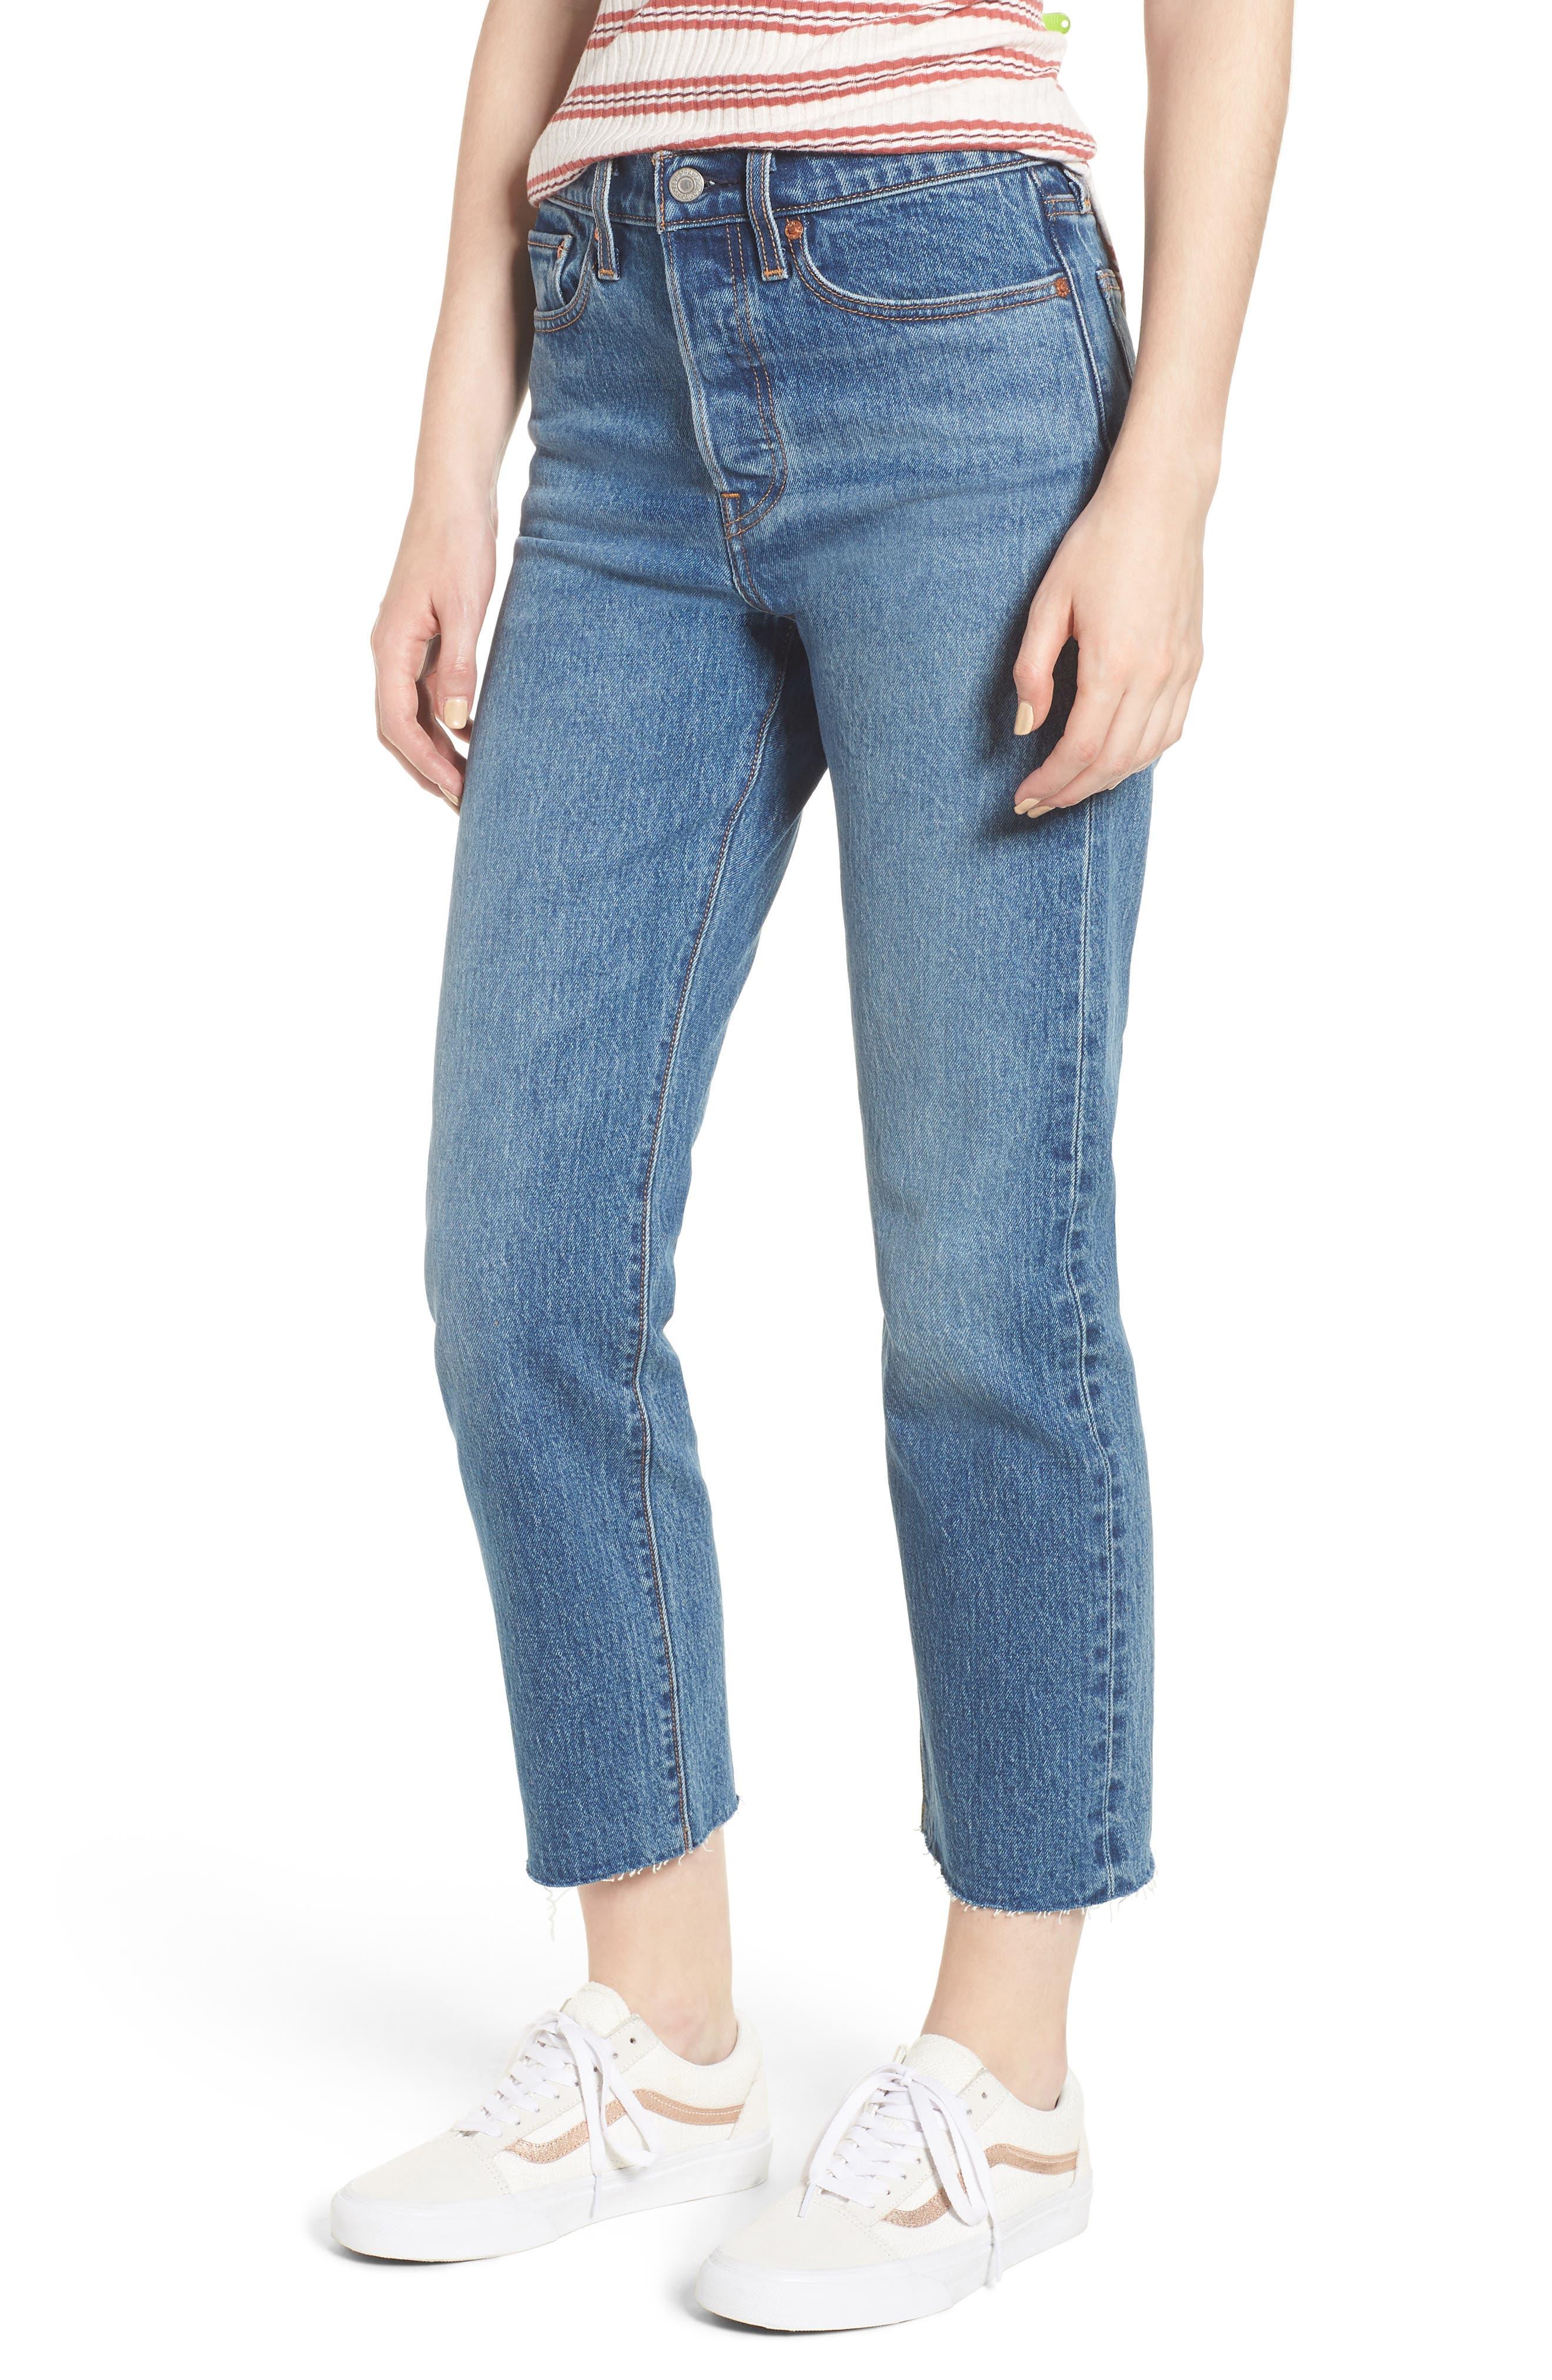 LEVI'S<SUP>®</SUP> Wedgie Raw Hem High Waist Straight Leg Jeans, Main, color, LOVE TRIANGLE